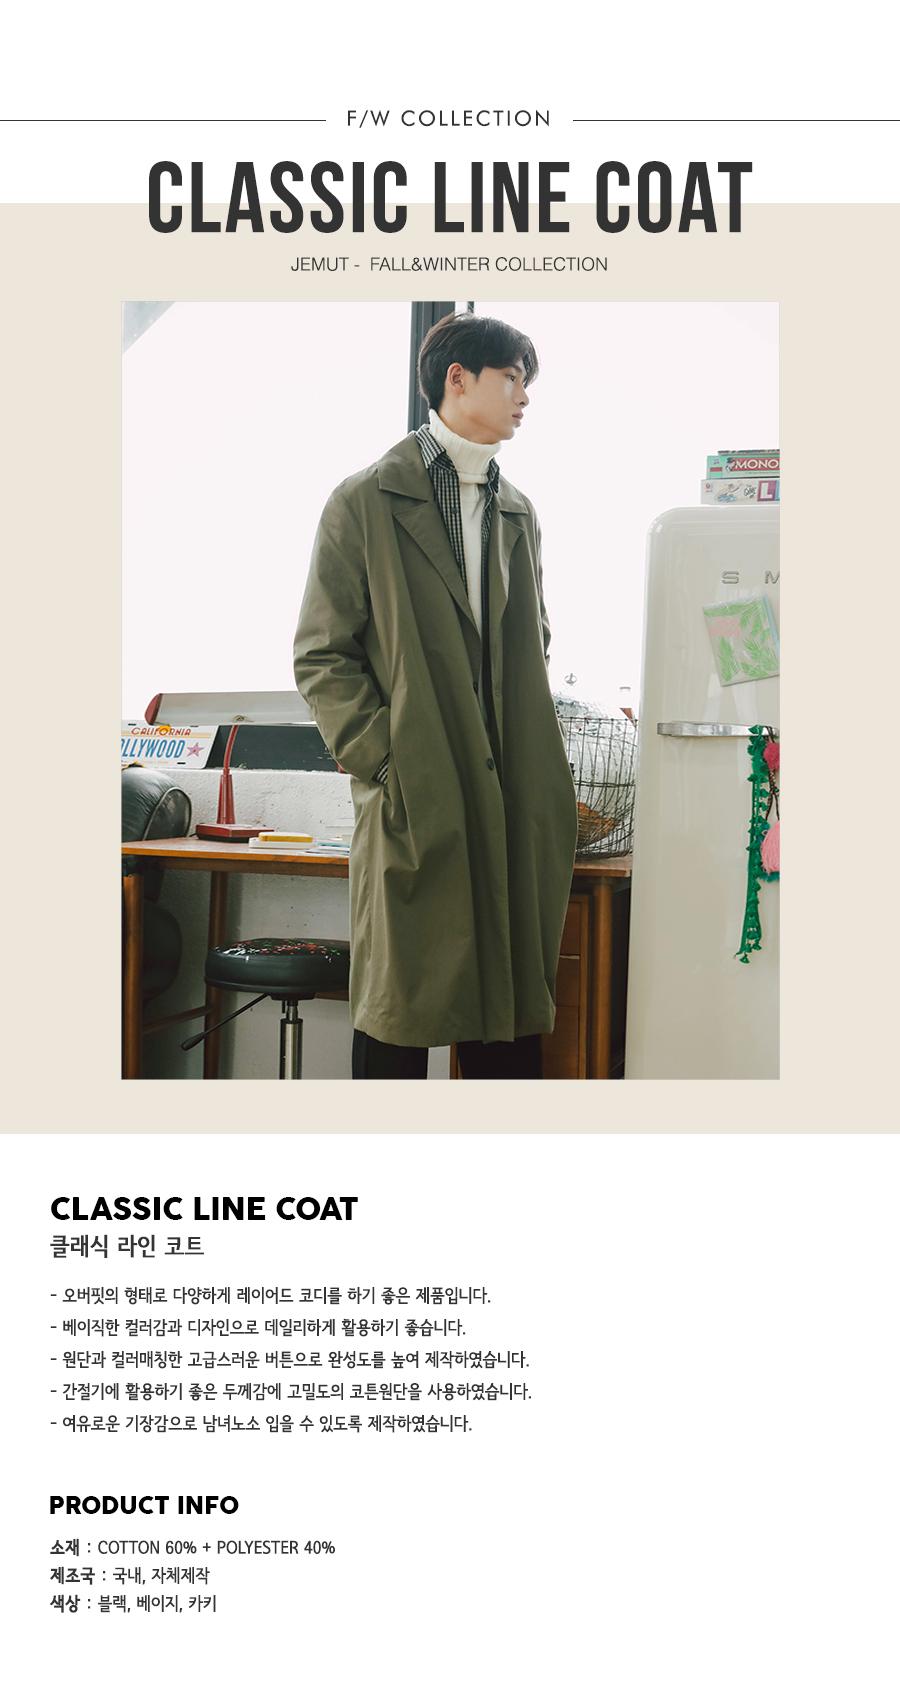 20181029_classic_line_coat_title_kj.jpg